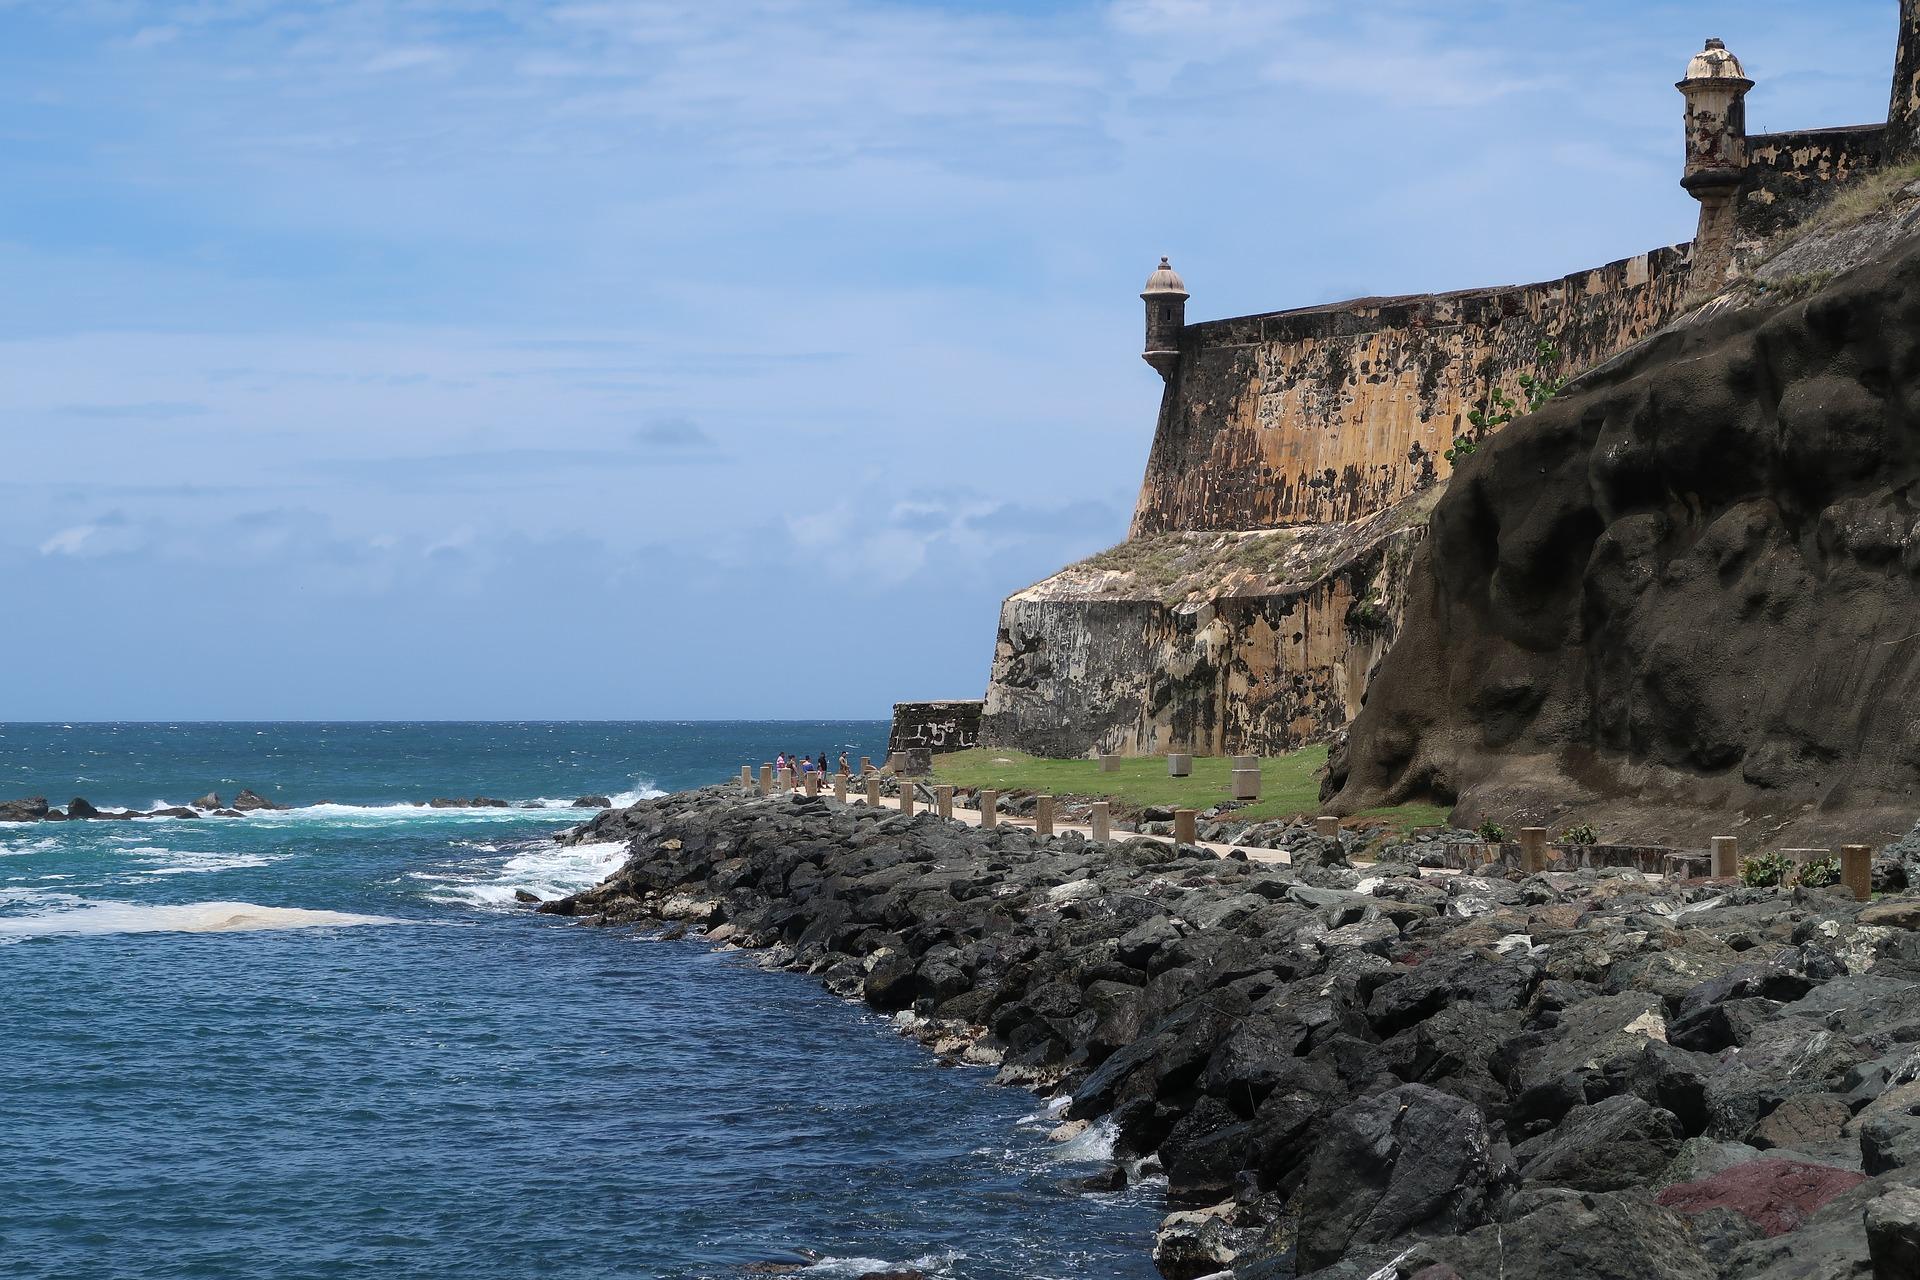 puerto-rico-san-juan-islands-alignthoughts